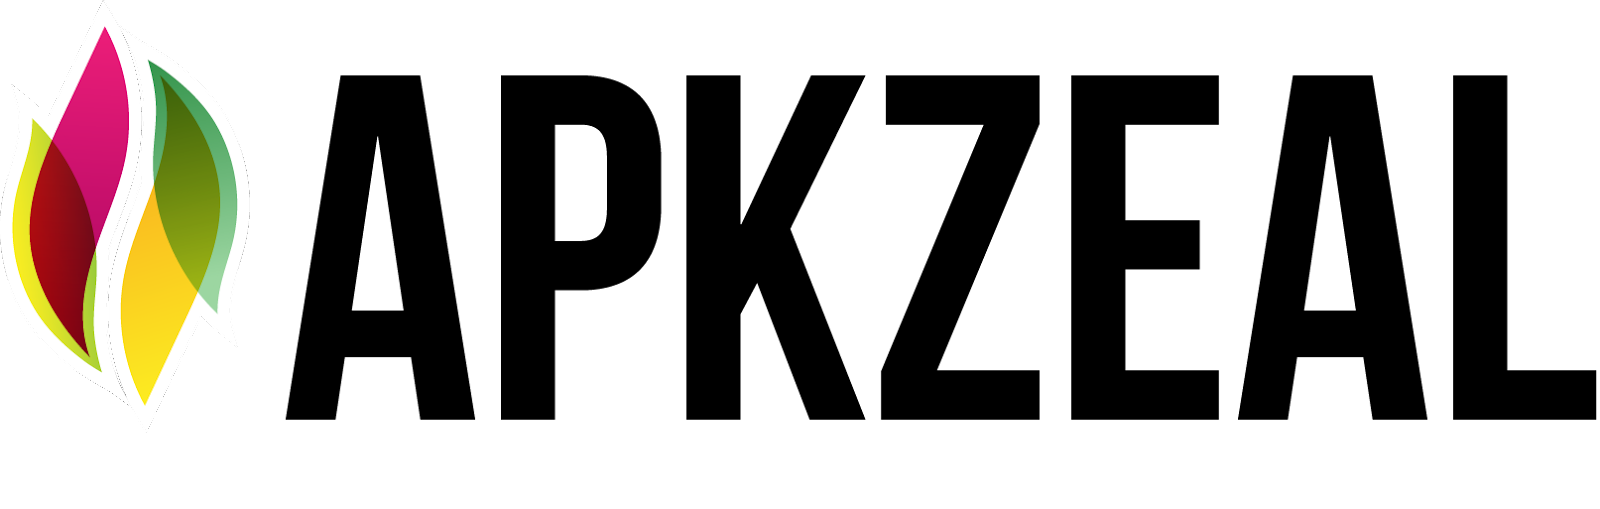 C:\Users\AdminTemp3\Desktop\SEO\PPD\0 SITES\Logos\apkzeal logo.png